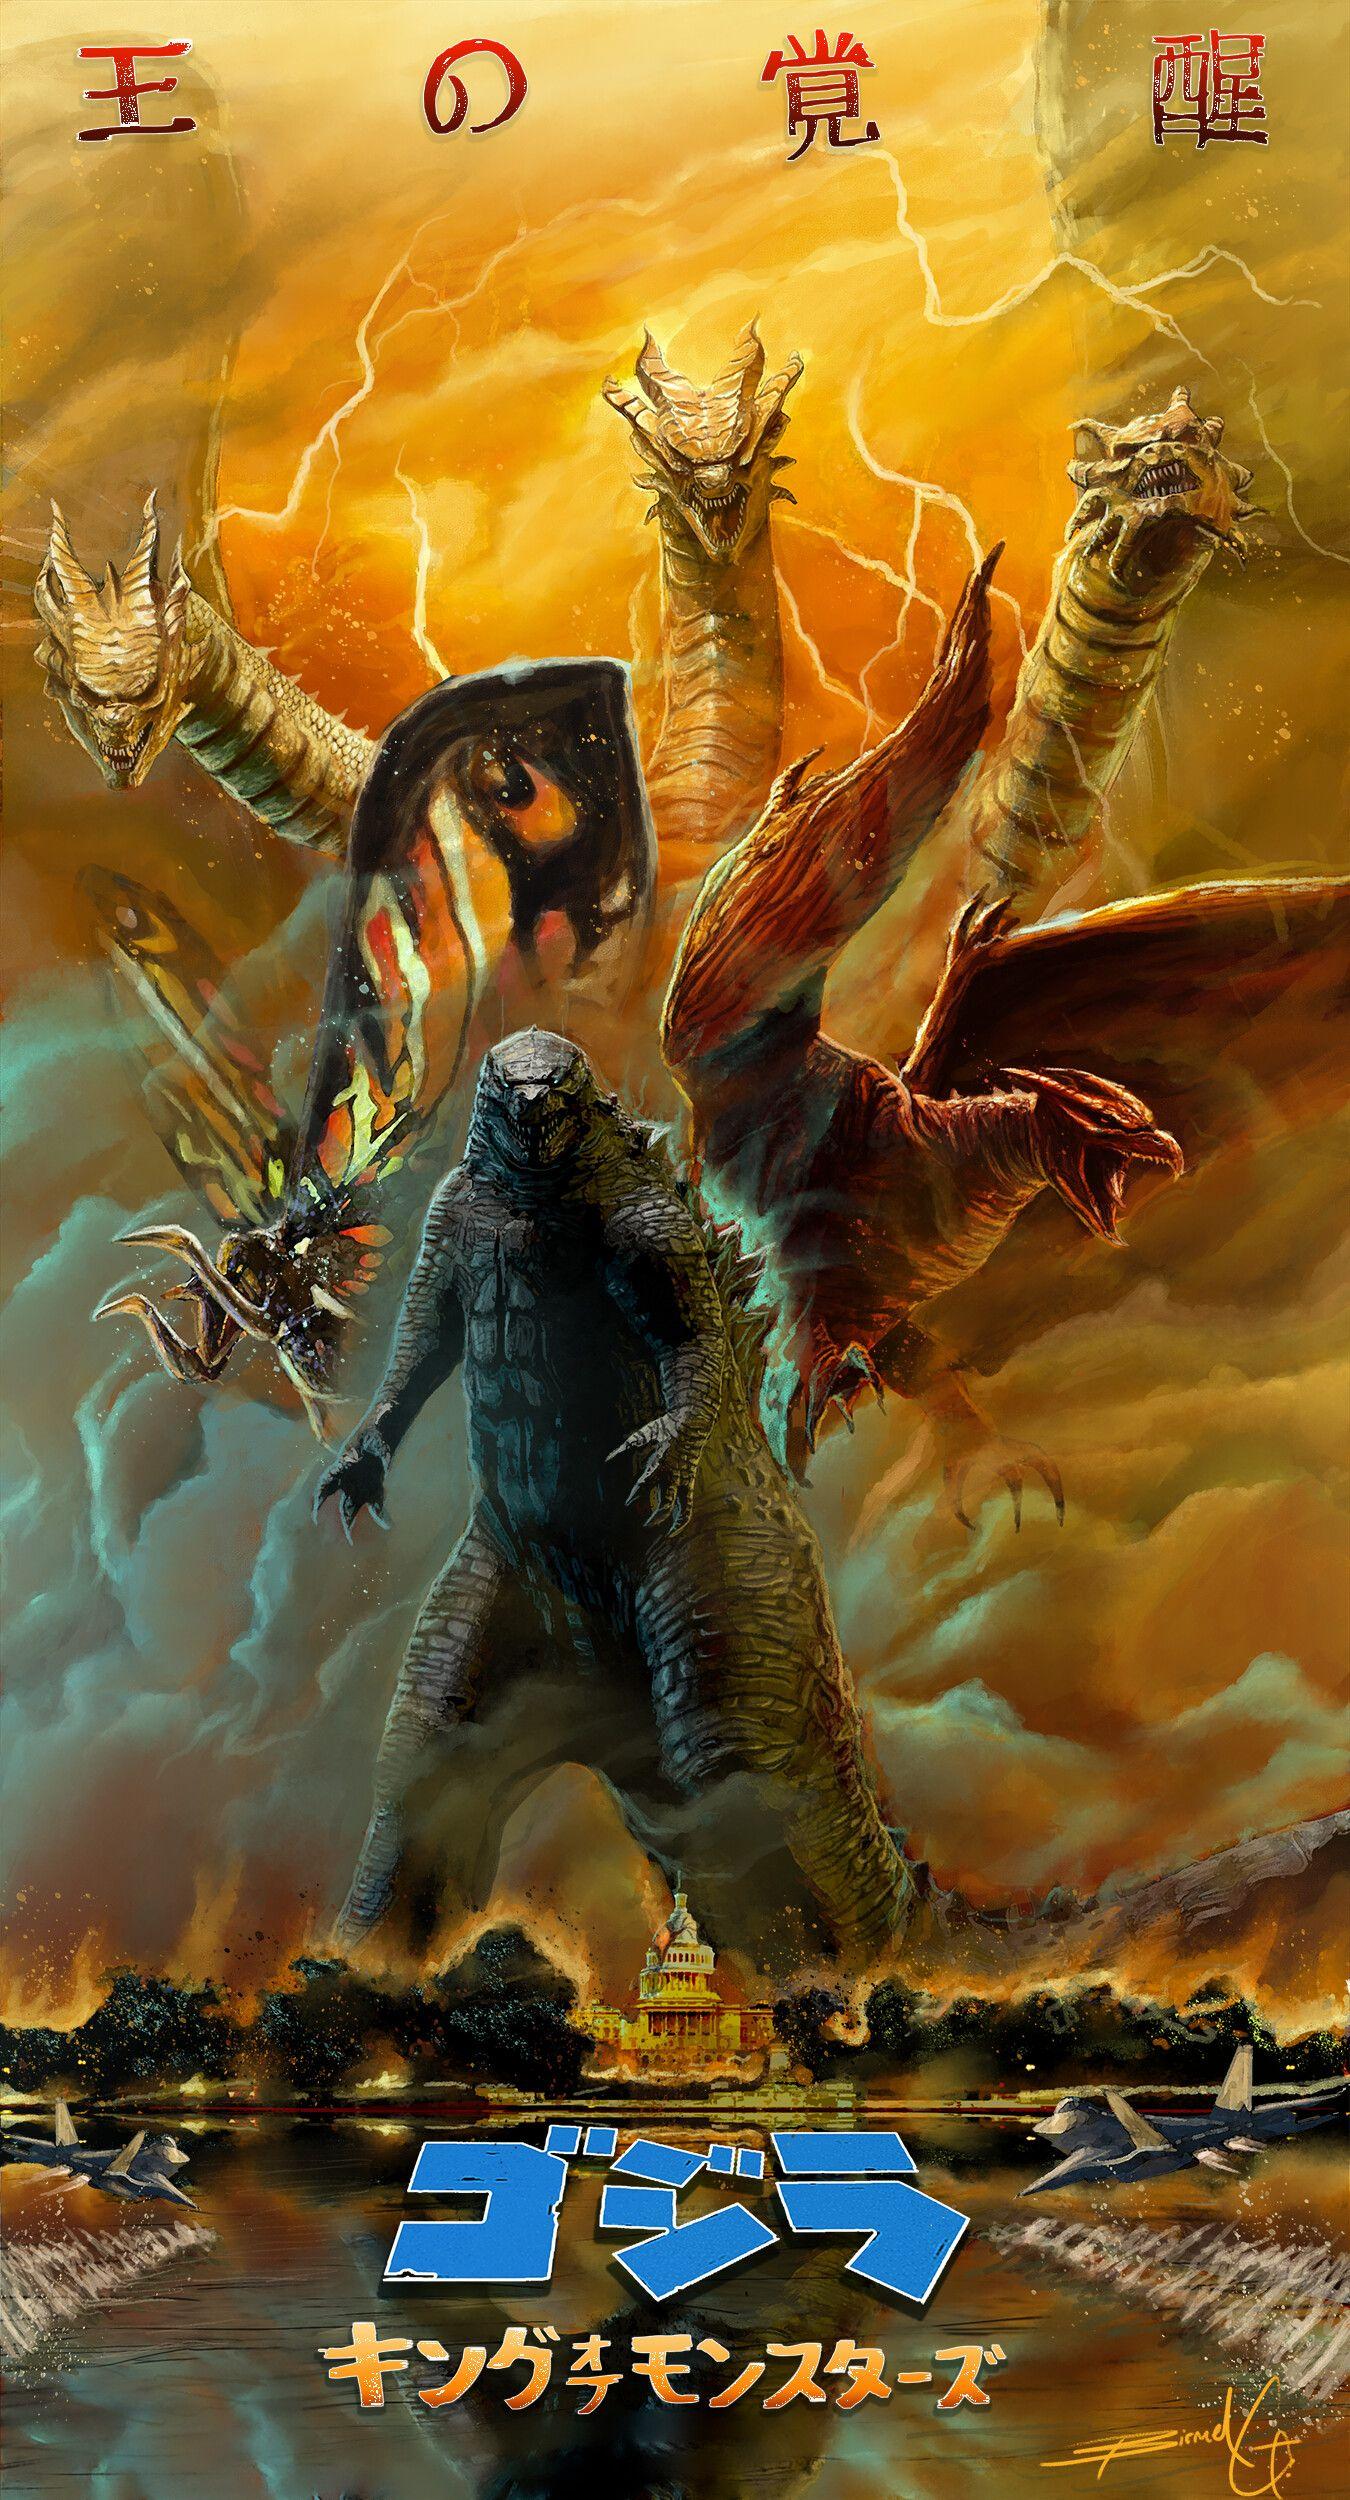 ArtStation Godzilla King of the Monsters Japanese Poster